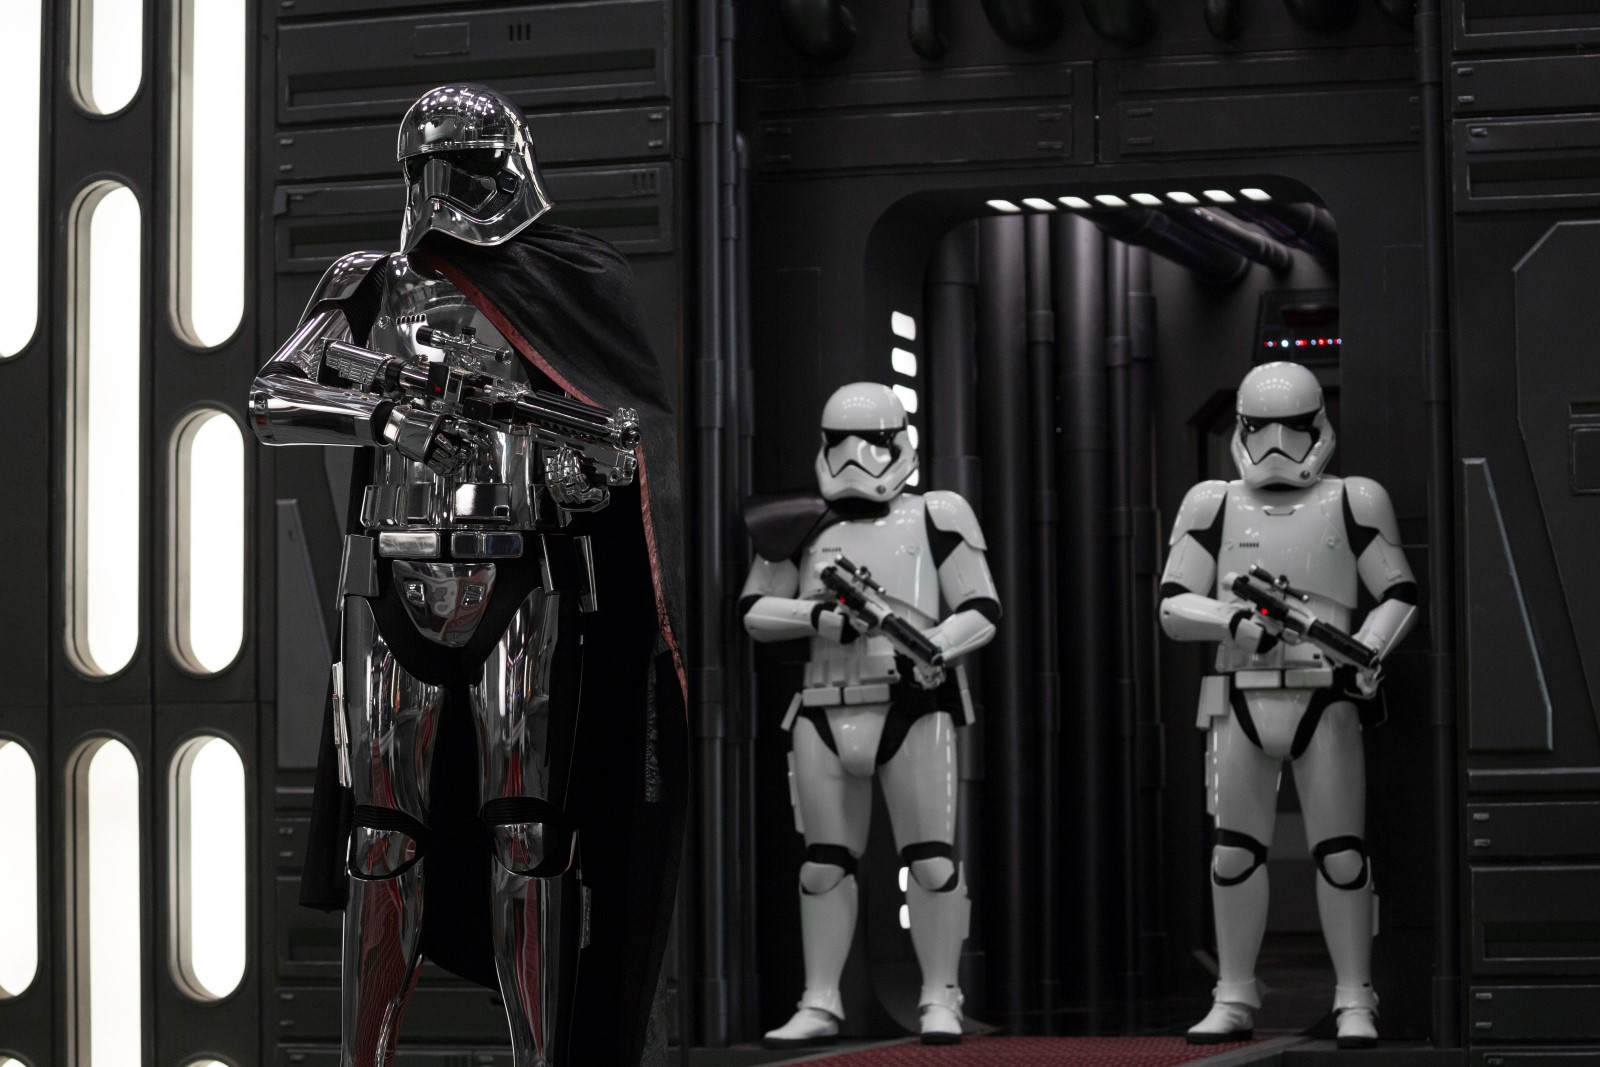 Star Wars : Episode 8 - Les Derniers Jedi - 2017